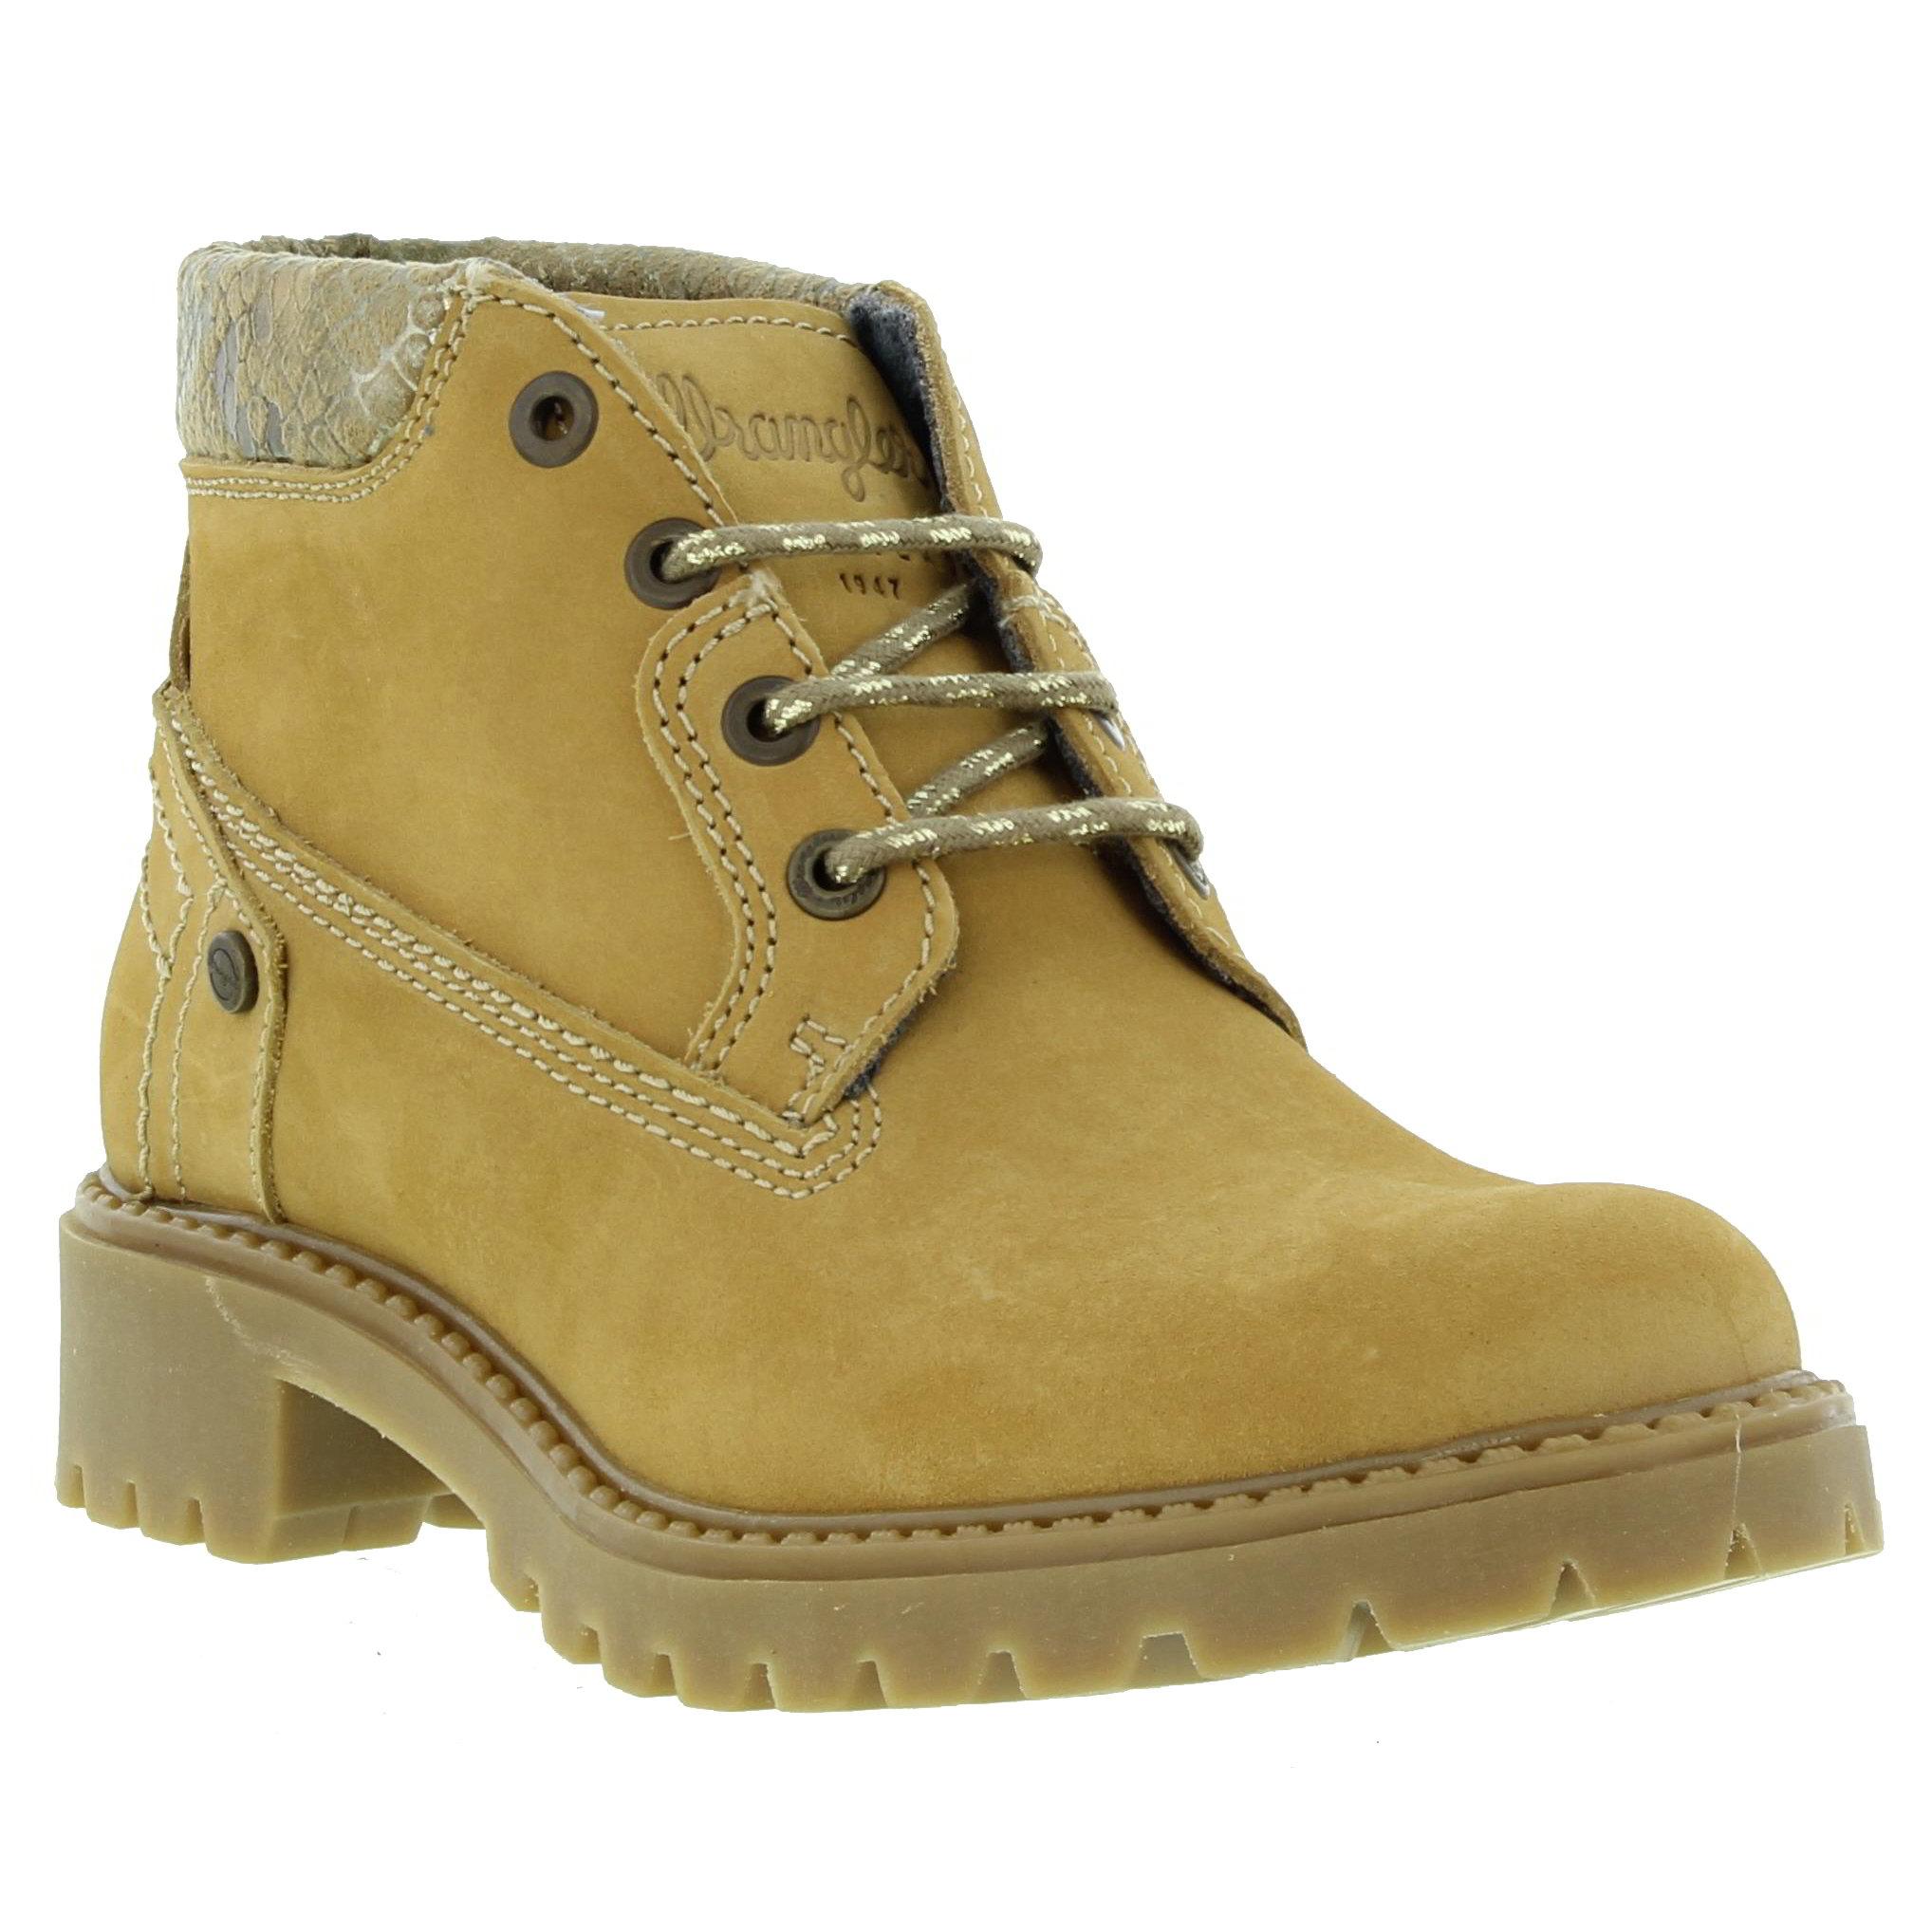 wrangler creek chukka womens brown leather ankle chukka